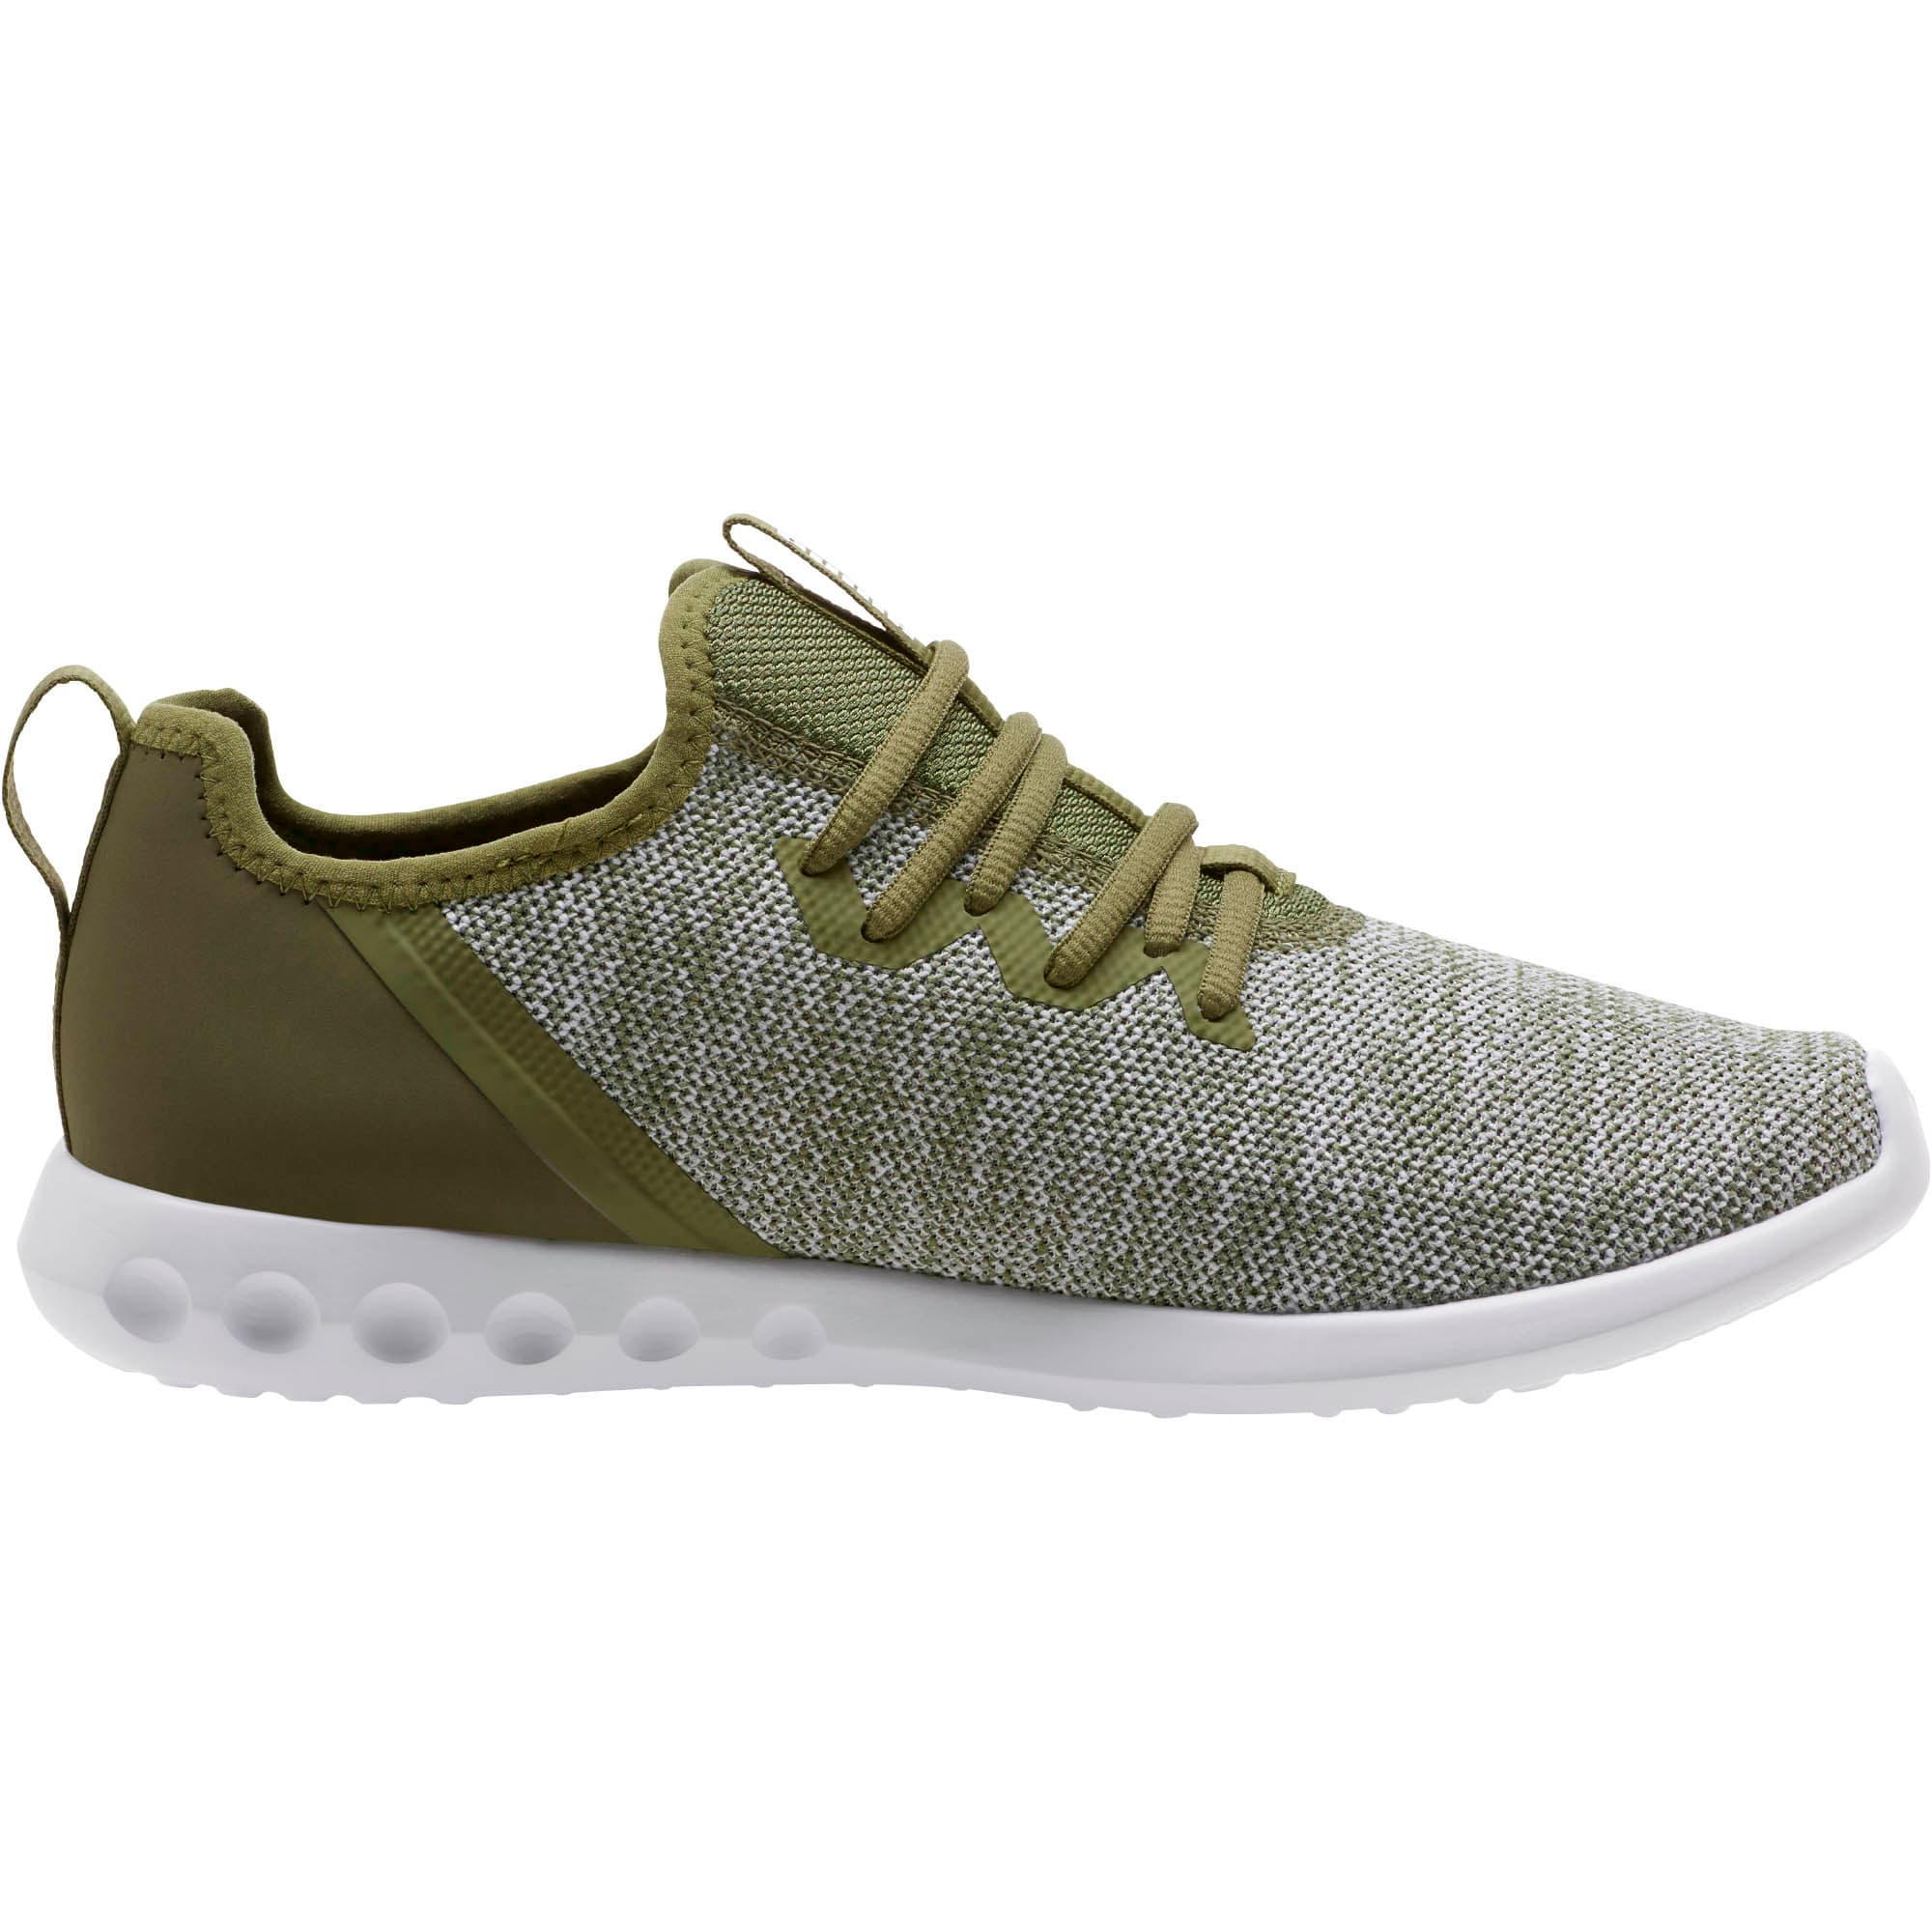 Thumbnail 3 of Carson 2 X Knit Men's Running Shoes, Olivine-Puma White, medium